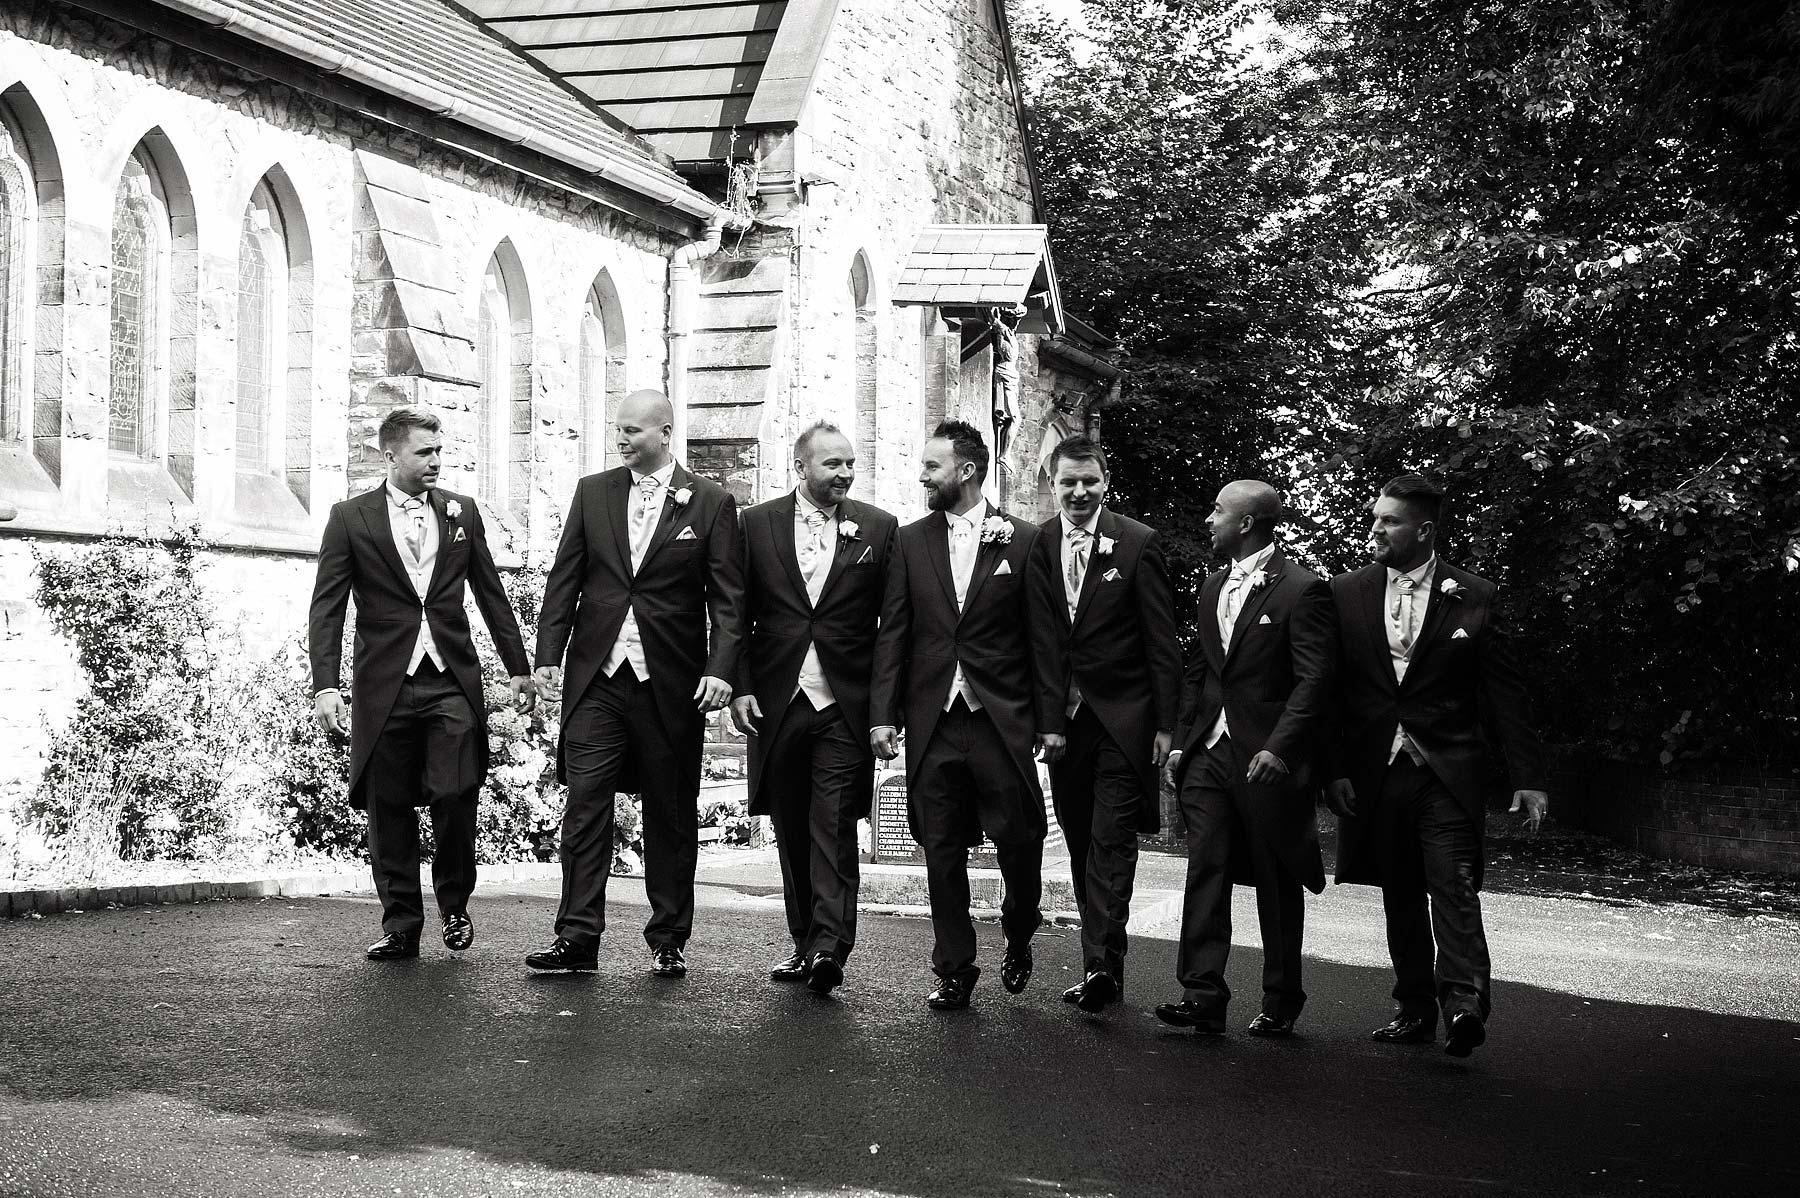 moat-house-church-wedding-photographs-010